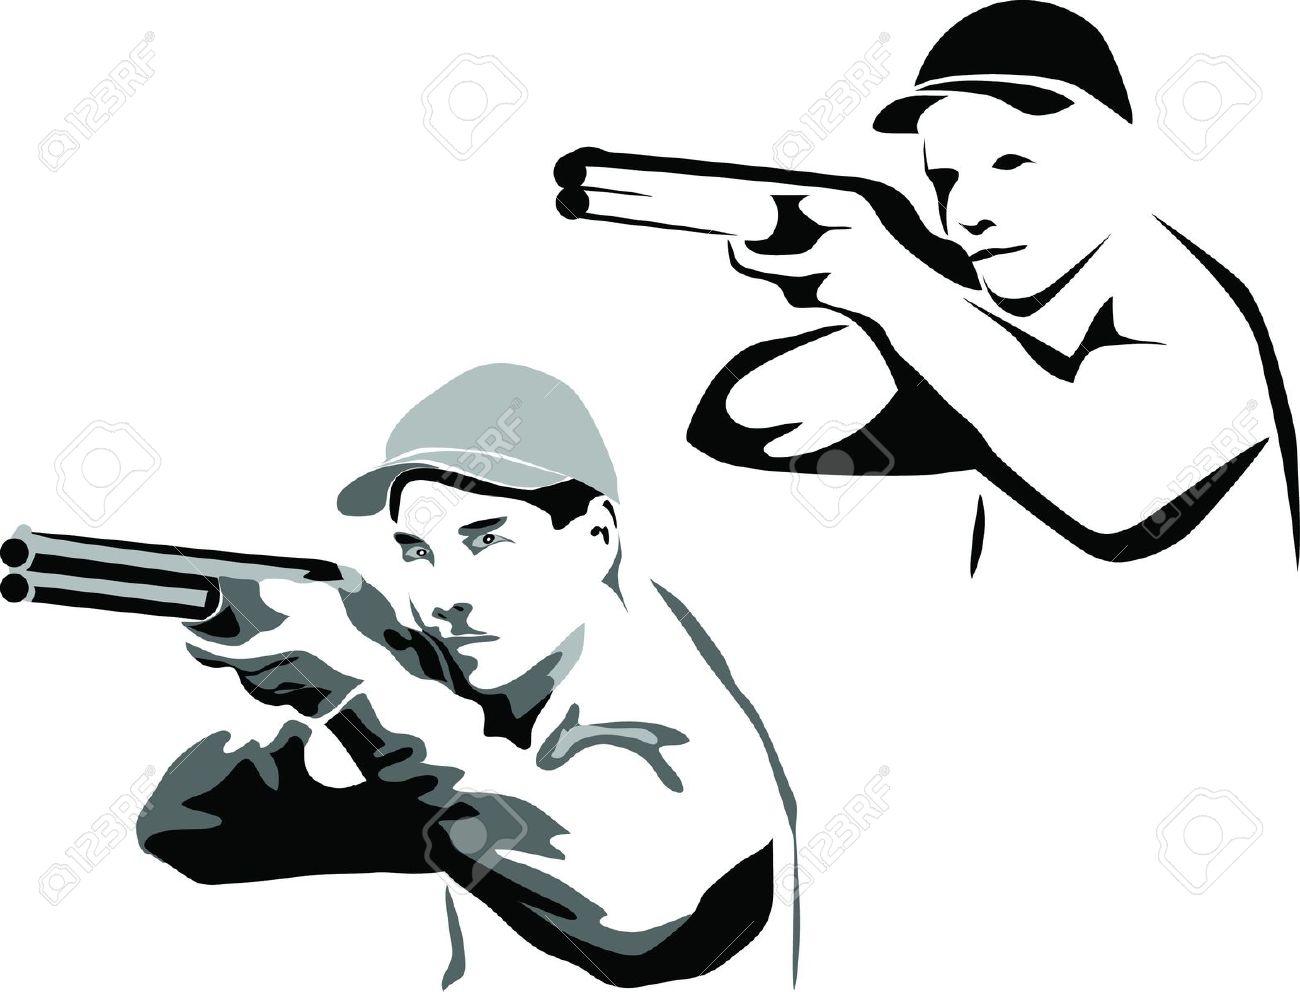 Images: Skeet Shooting Clipart.